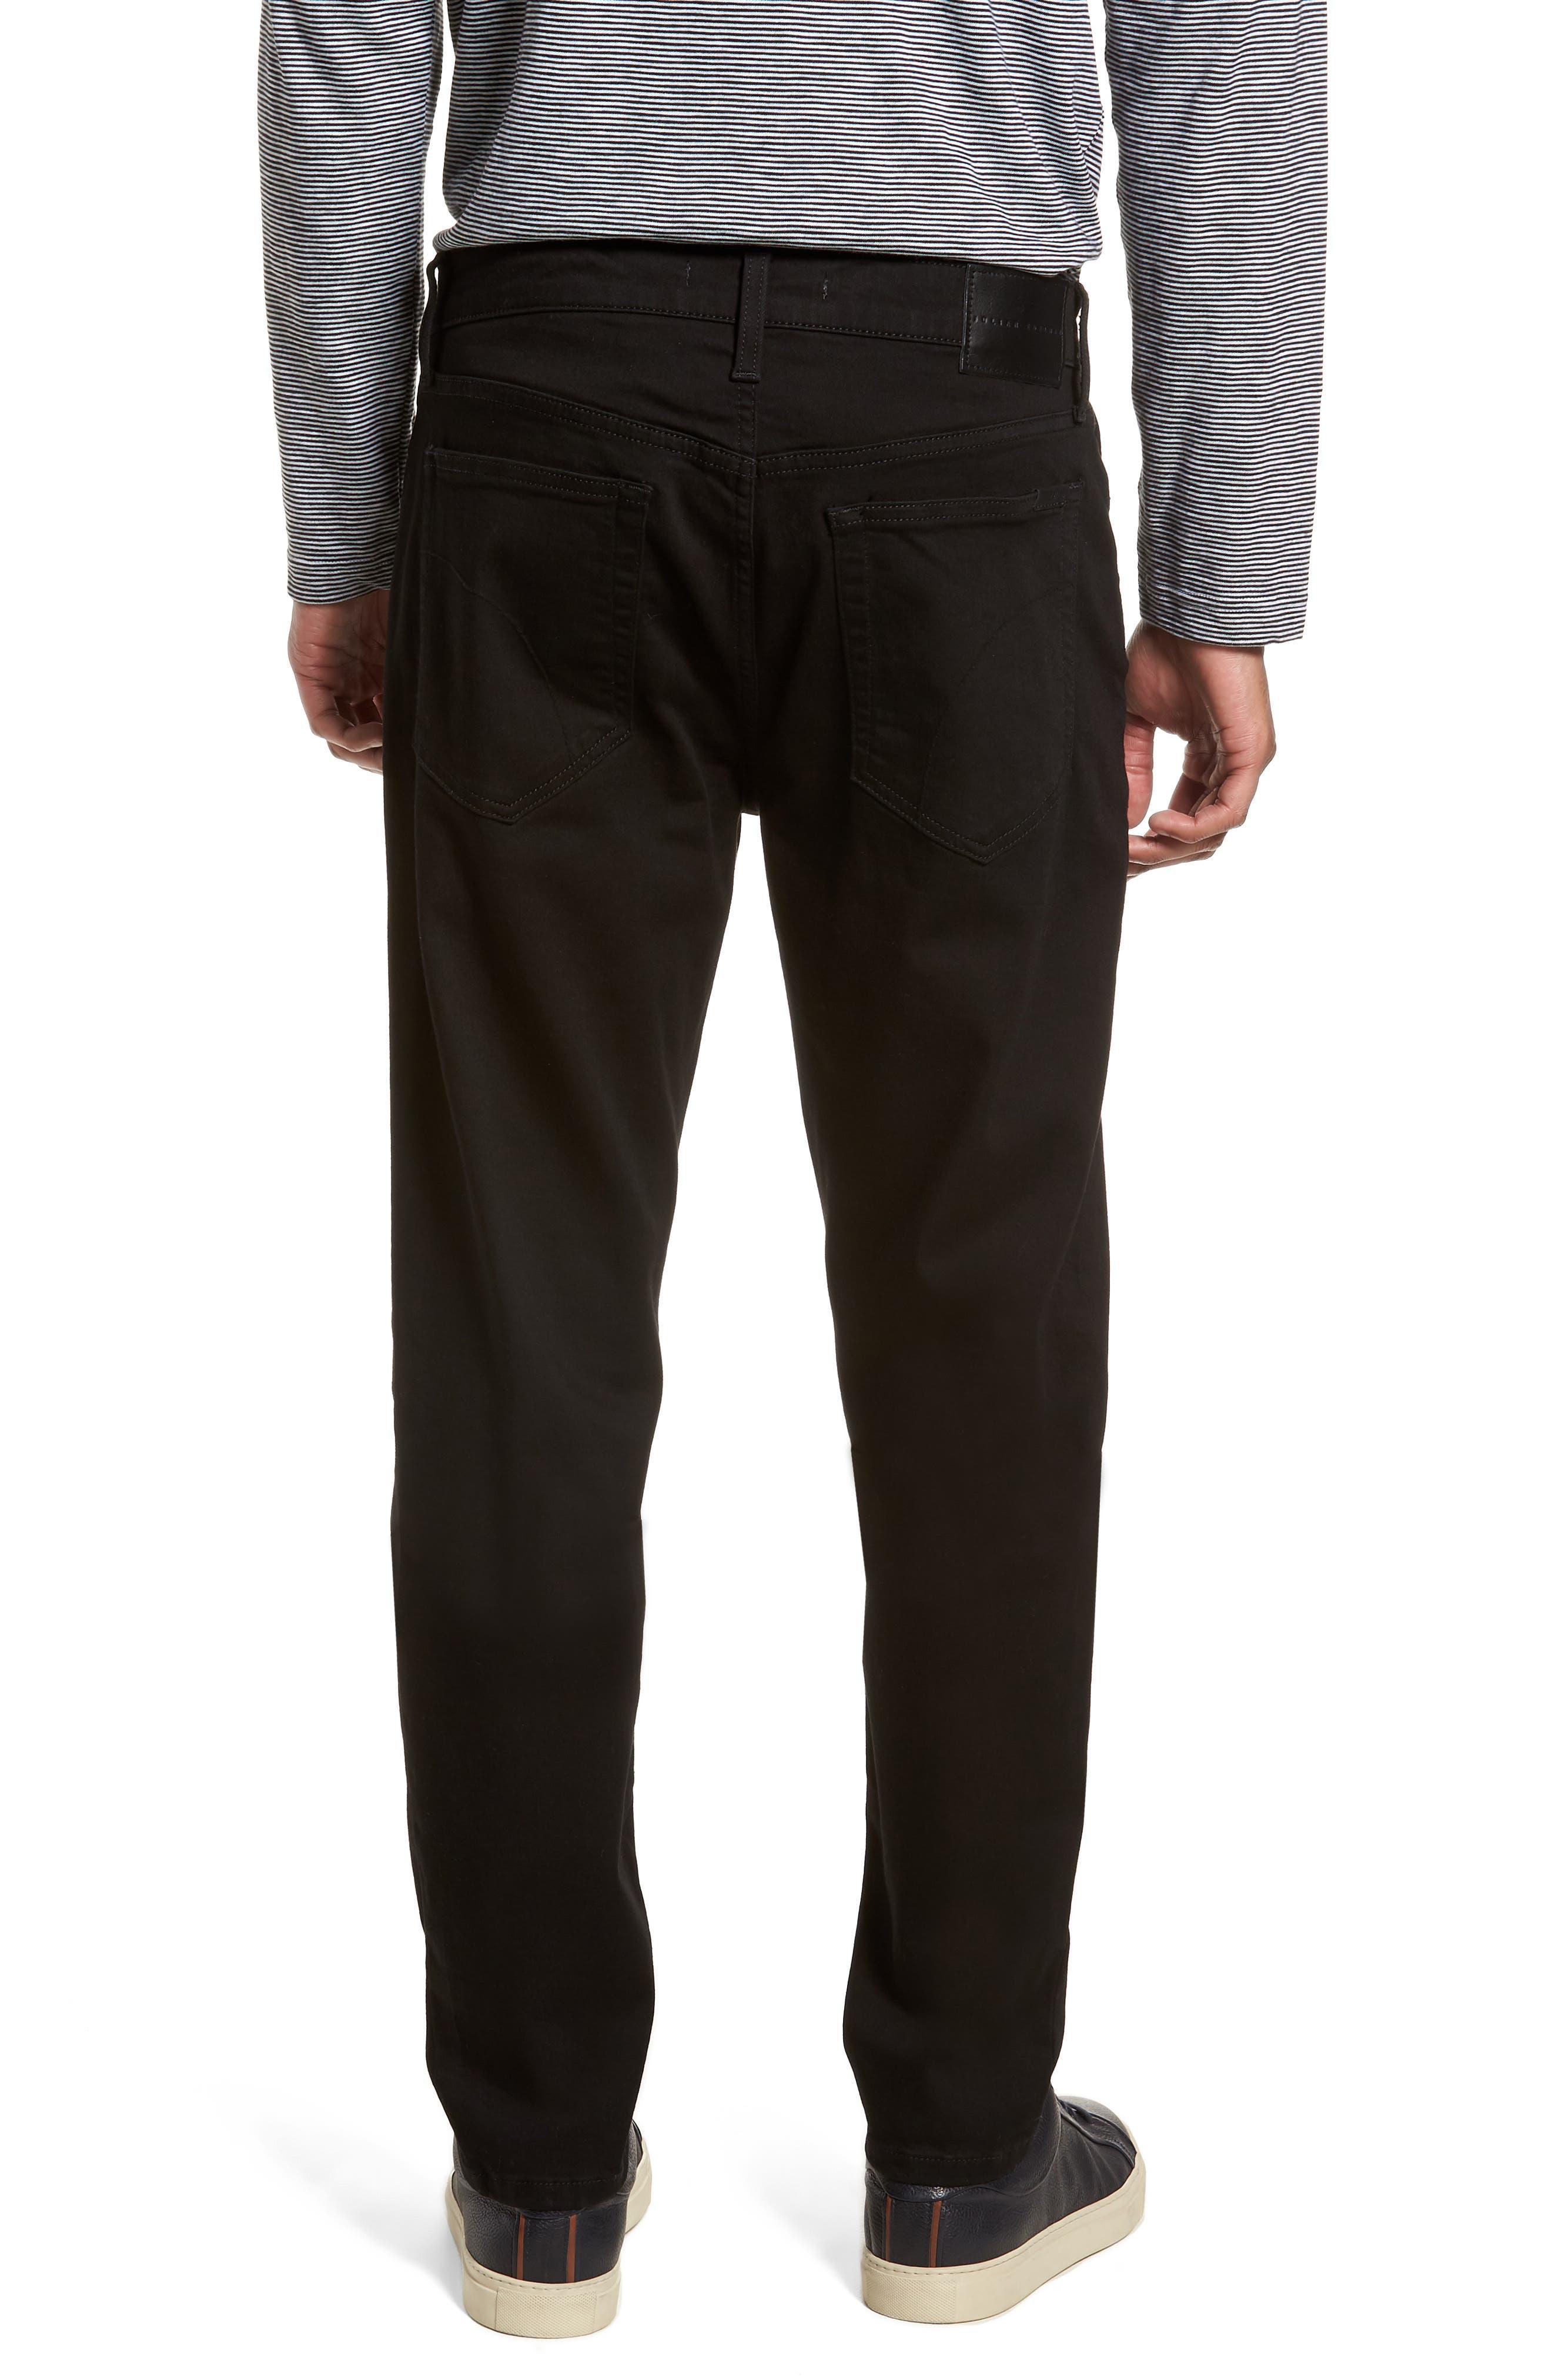 Folsom Athletic Slim Fit Jeans,                             Alternate thumbnail 2, color,                             Edleman